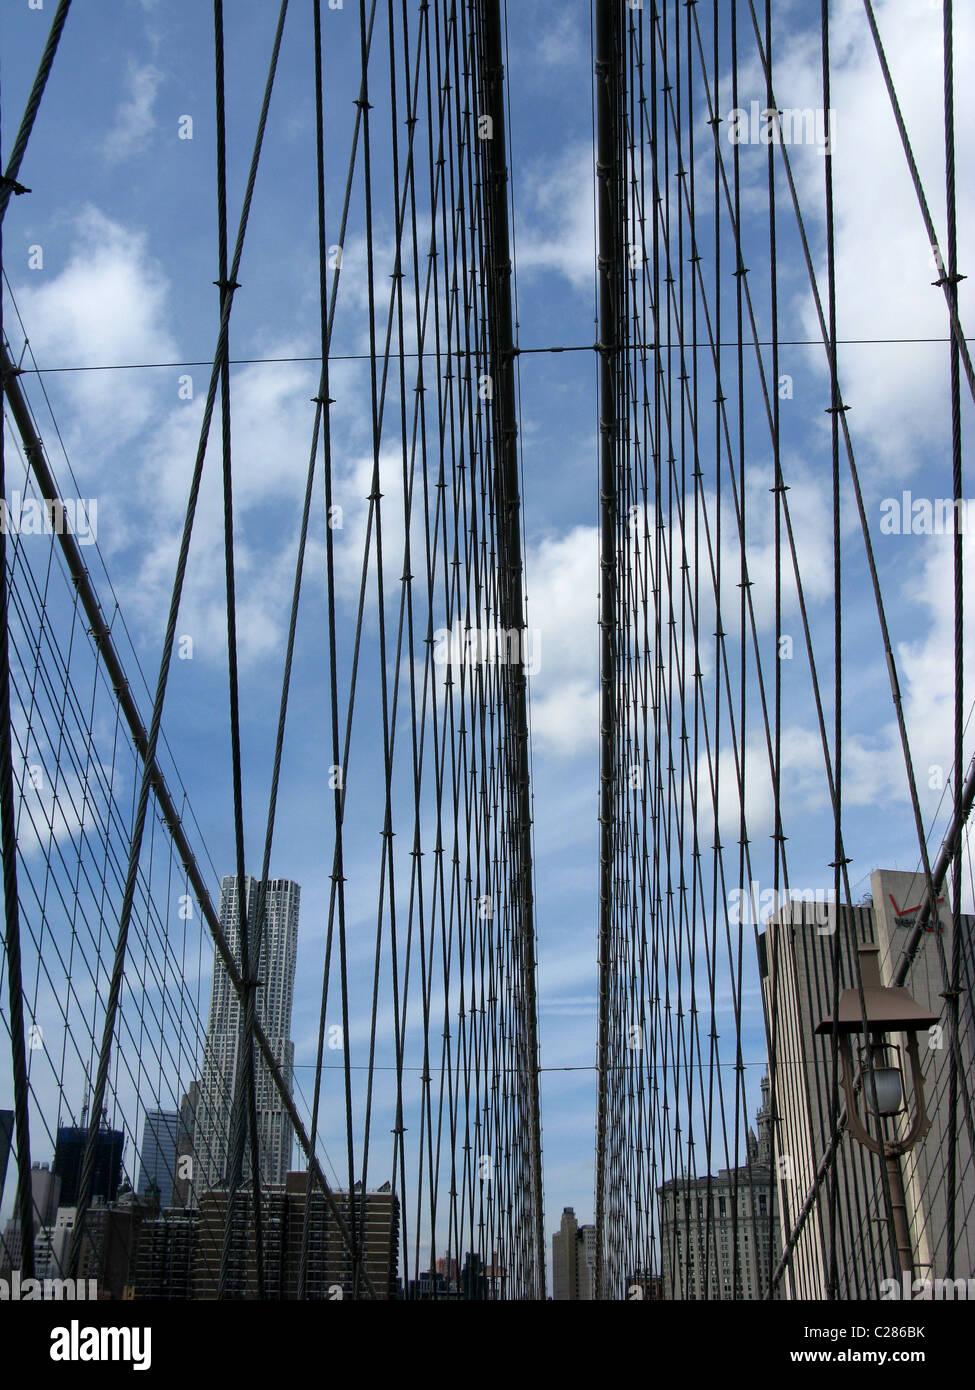 Brooklyn Bridge, New York City, USA - Stock Image